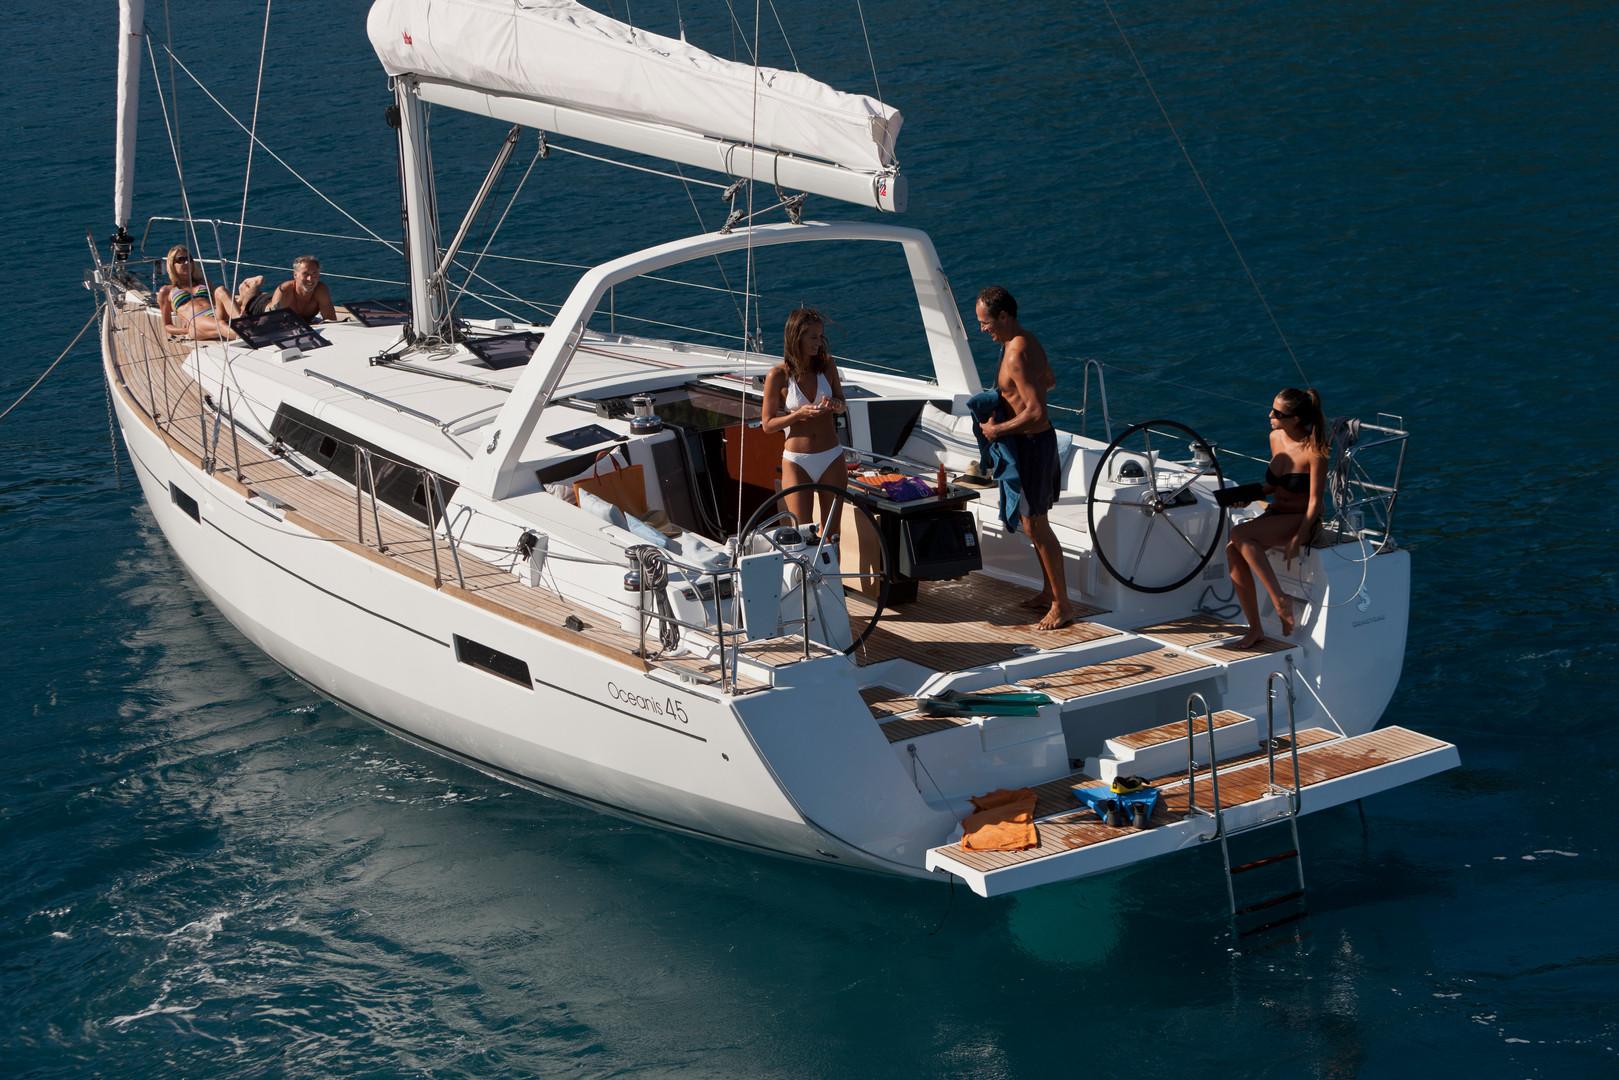 Above deck: Back of boat